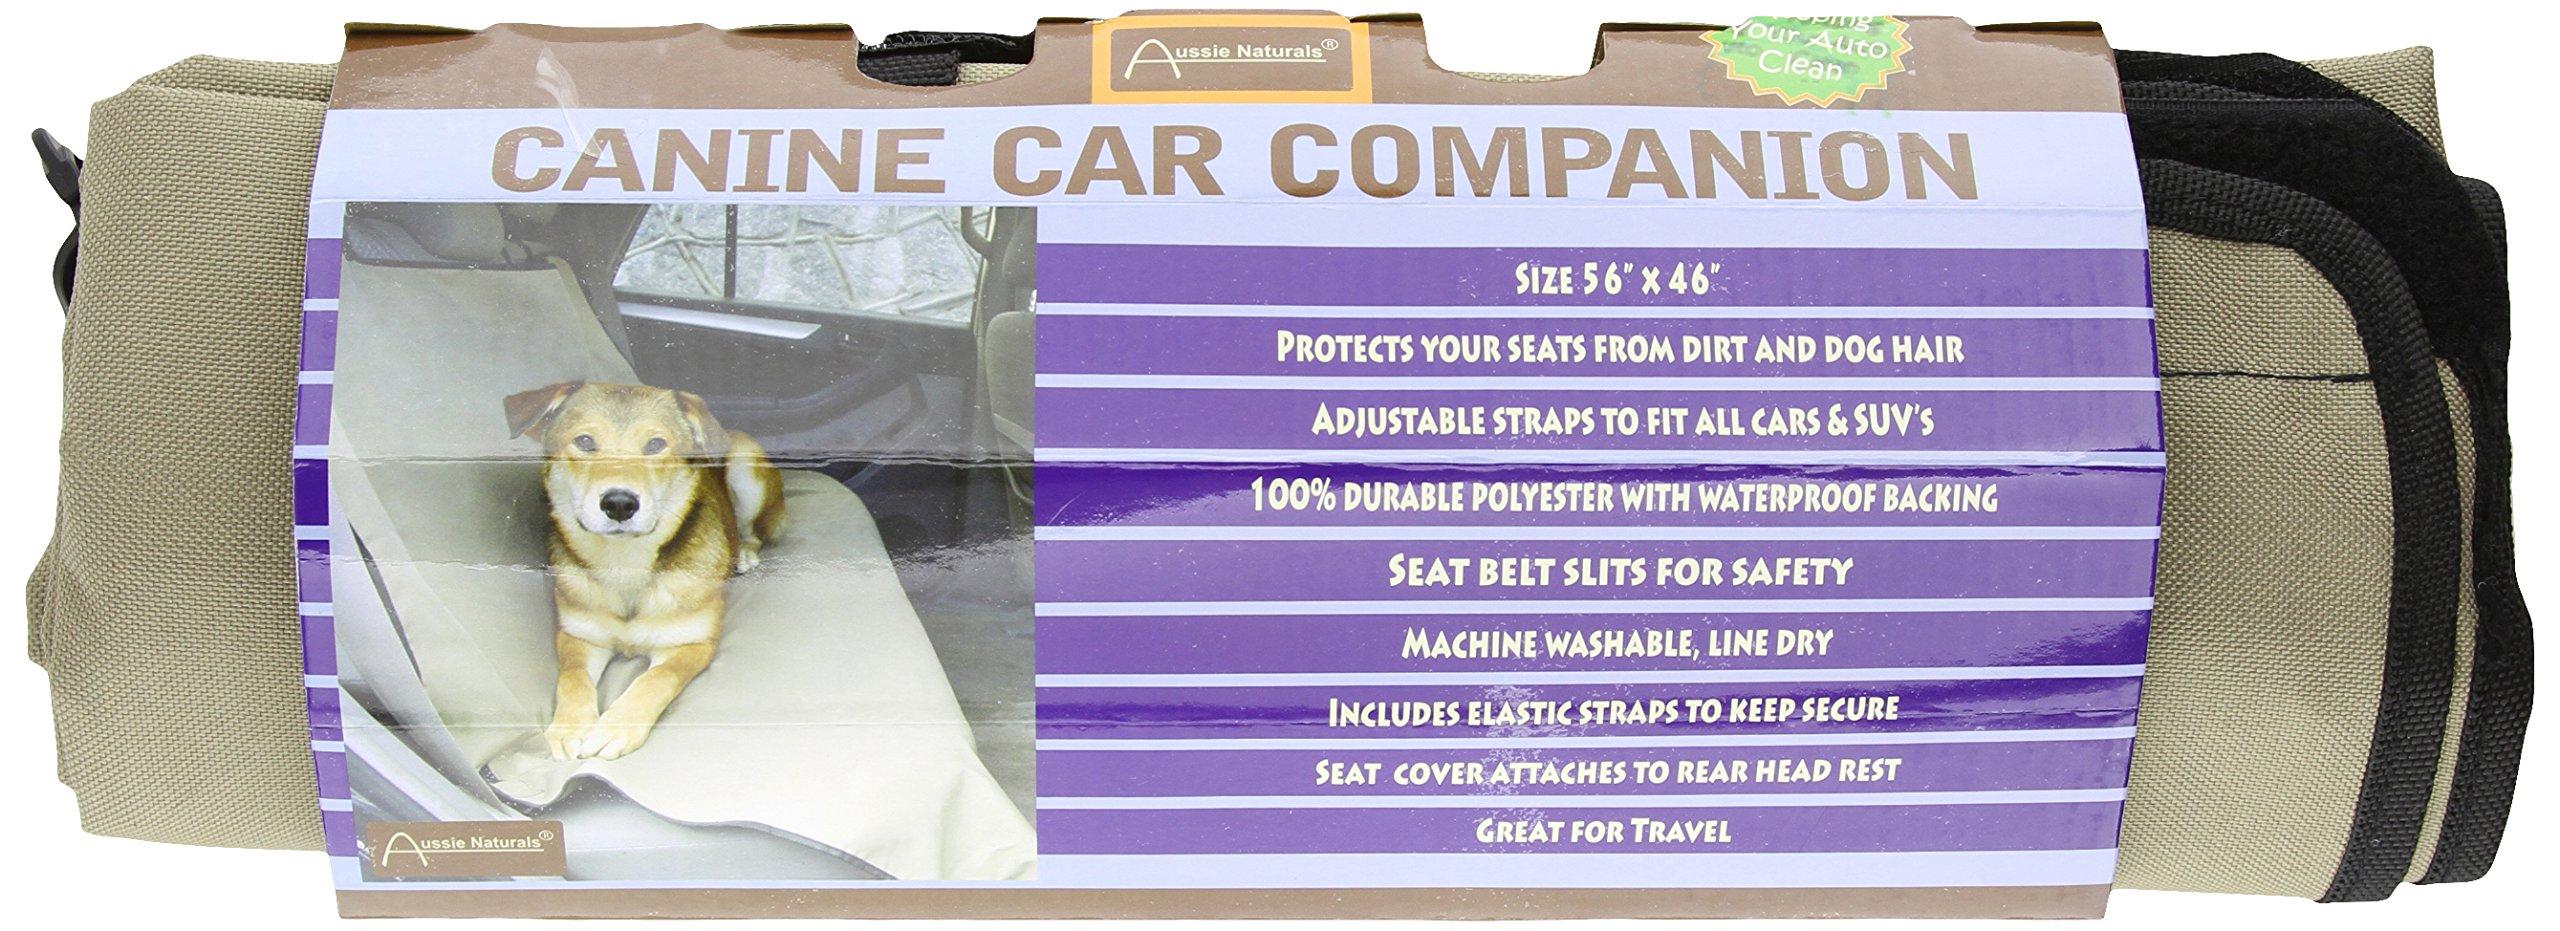 ABO Gear Travel Car Companion for Pets